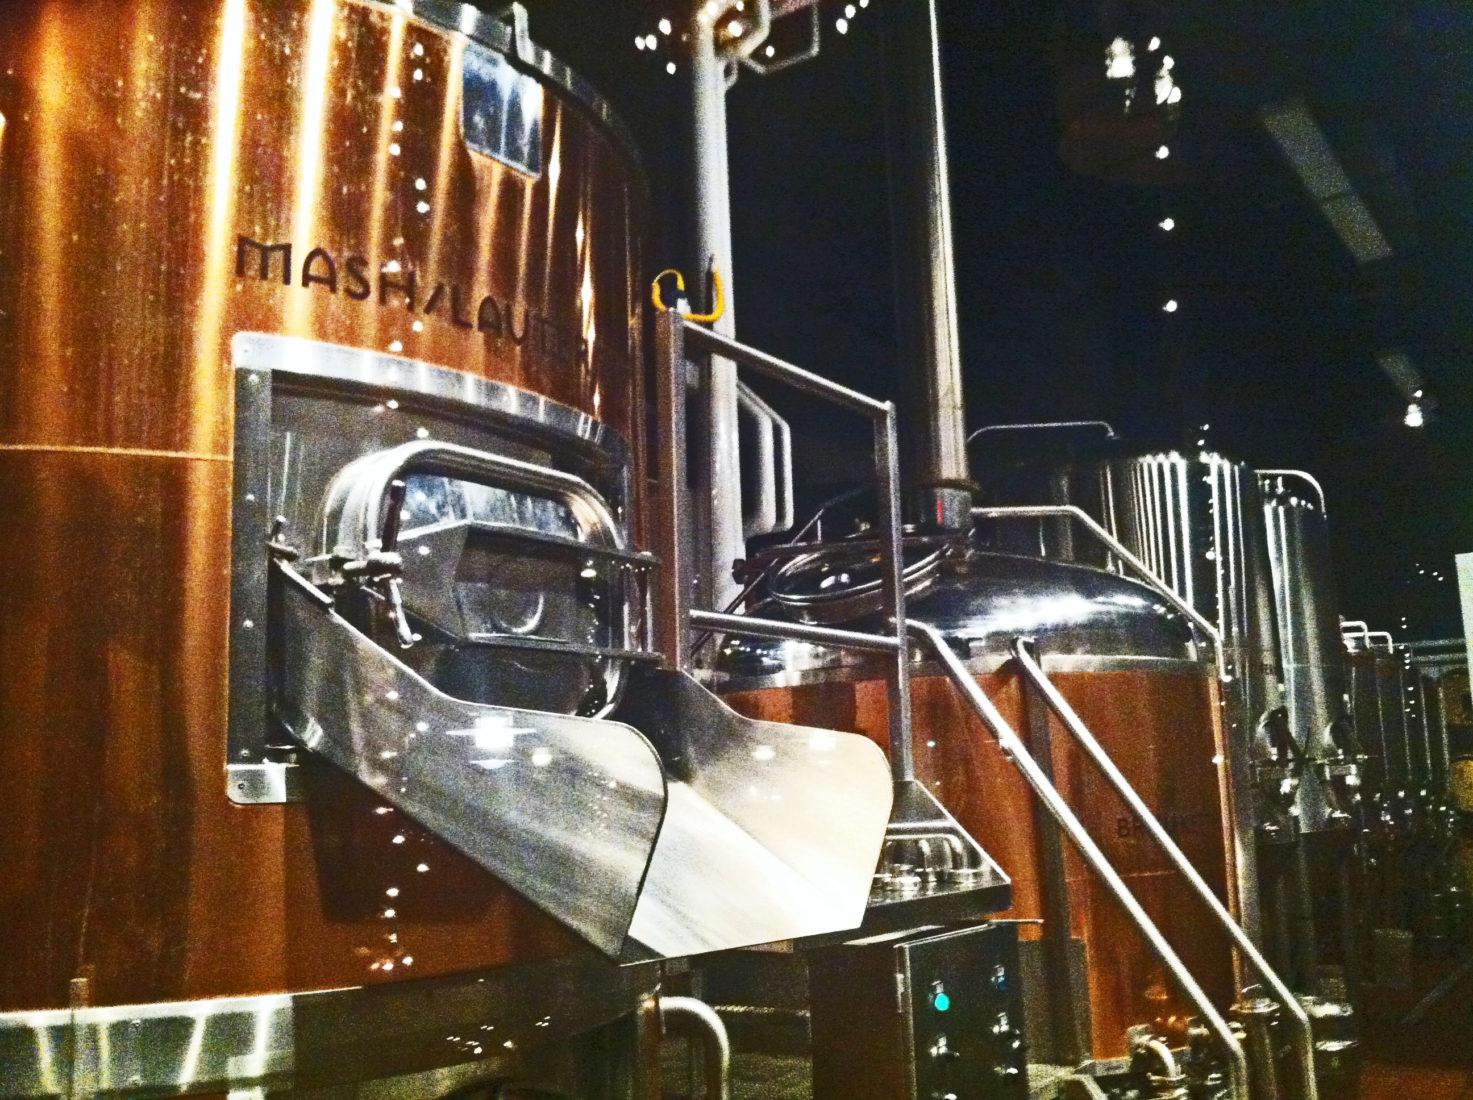 Iron Hill Brewery, Maple Shade, NJ